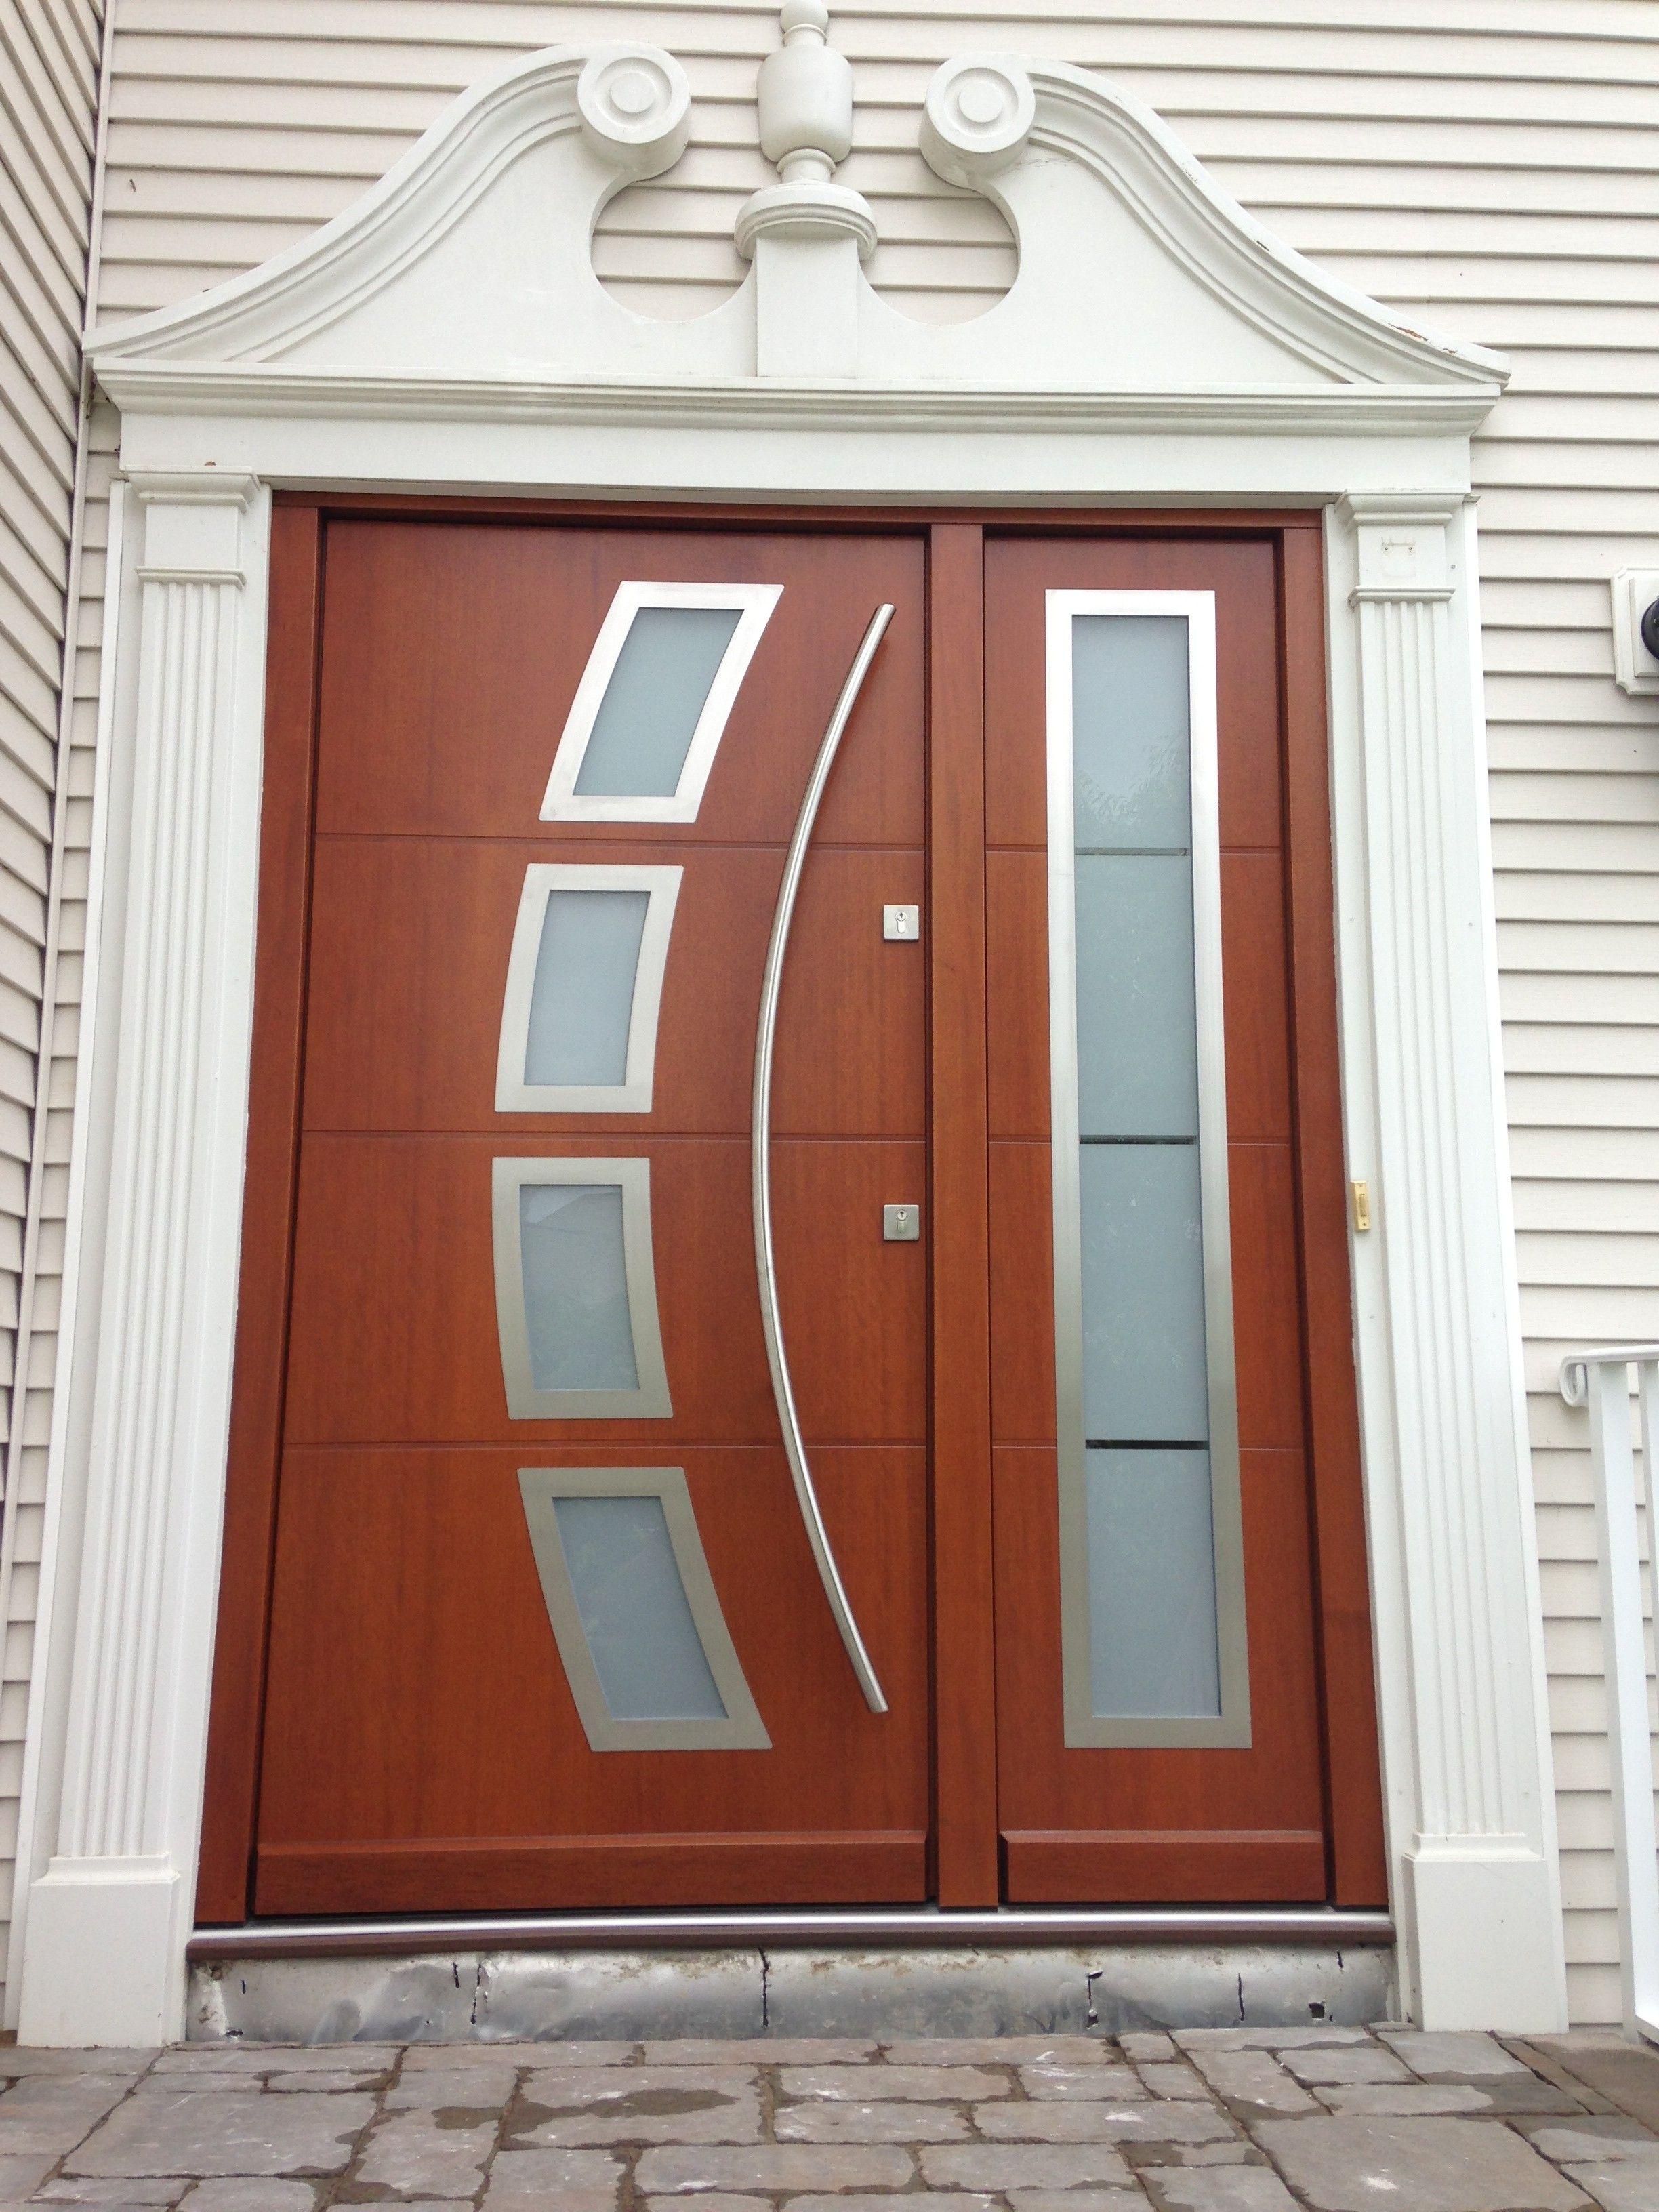 Modern Entry Door Pulls. This Unique Front Door Throws A Twist On Classic  Design.